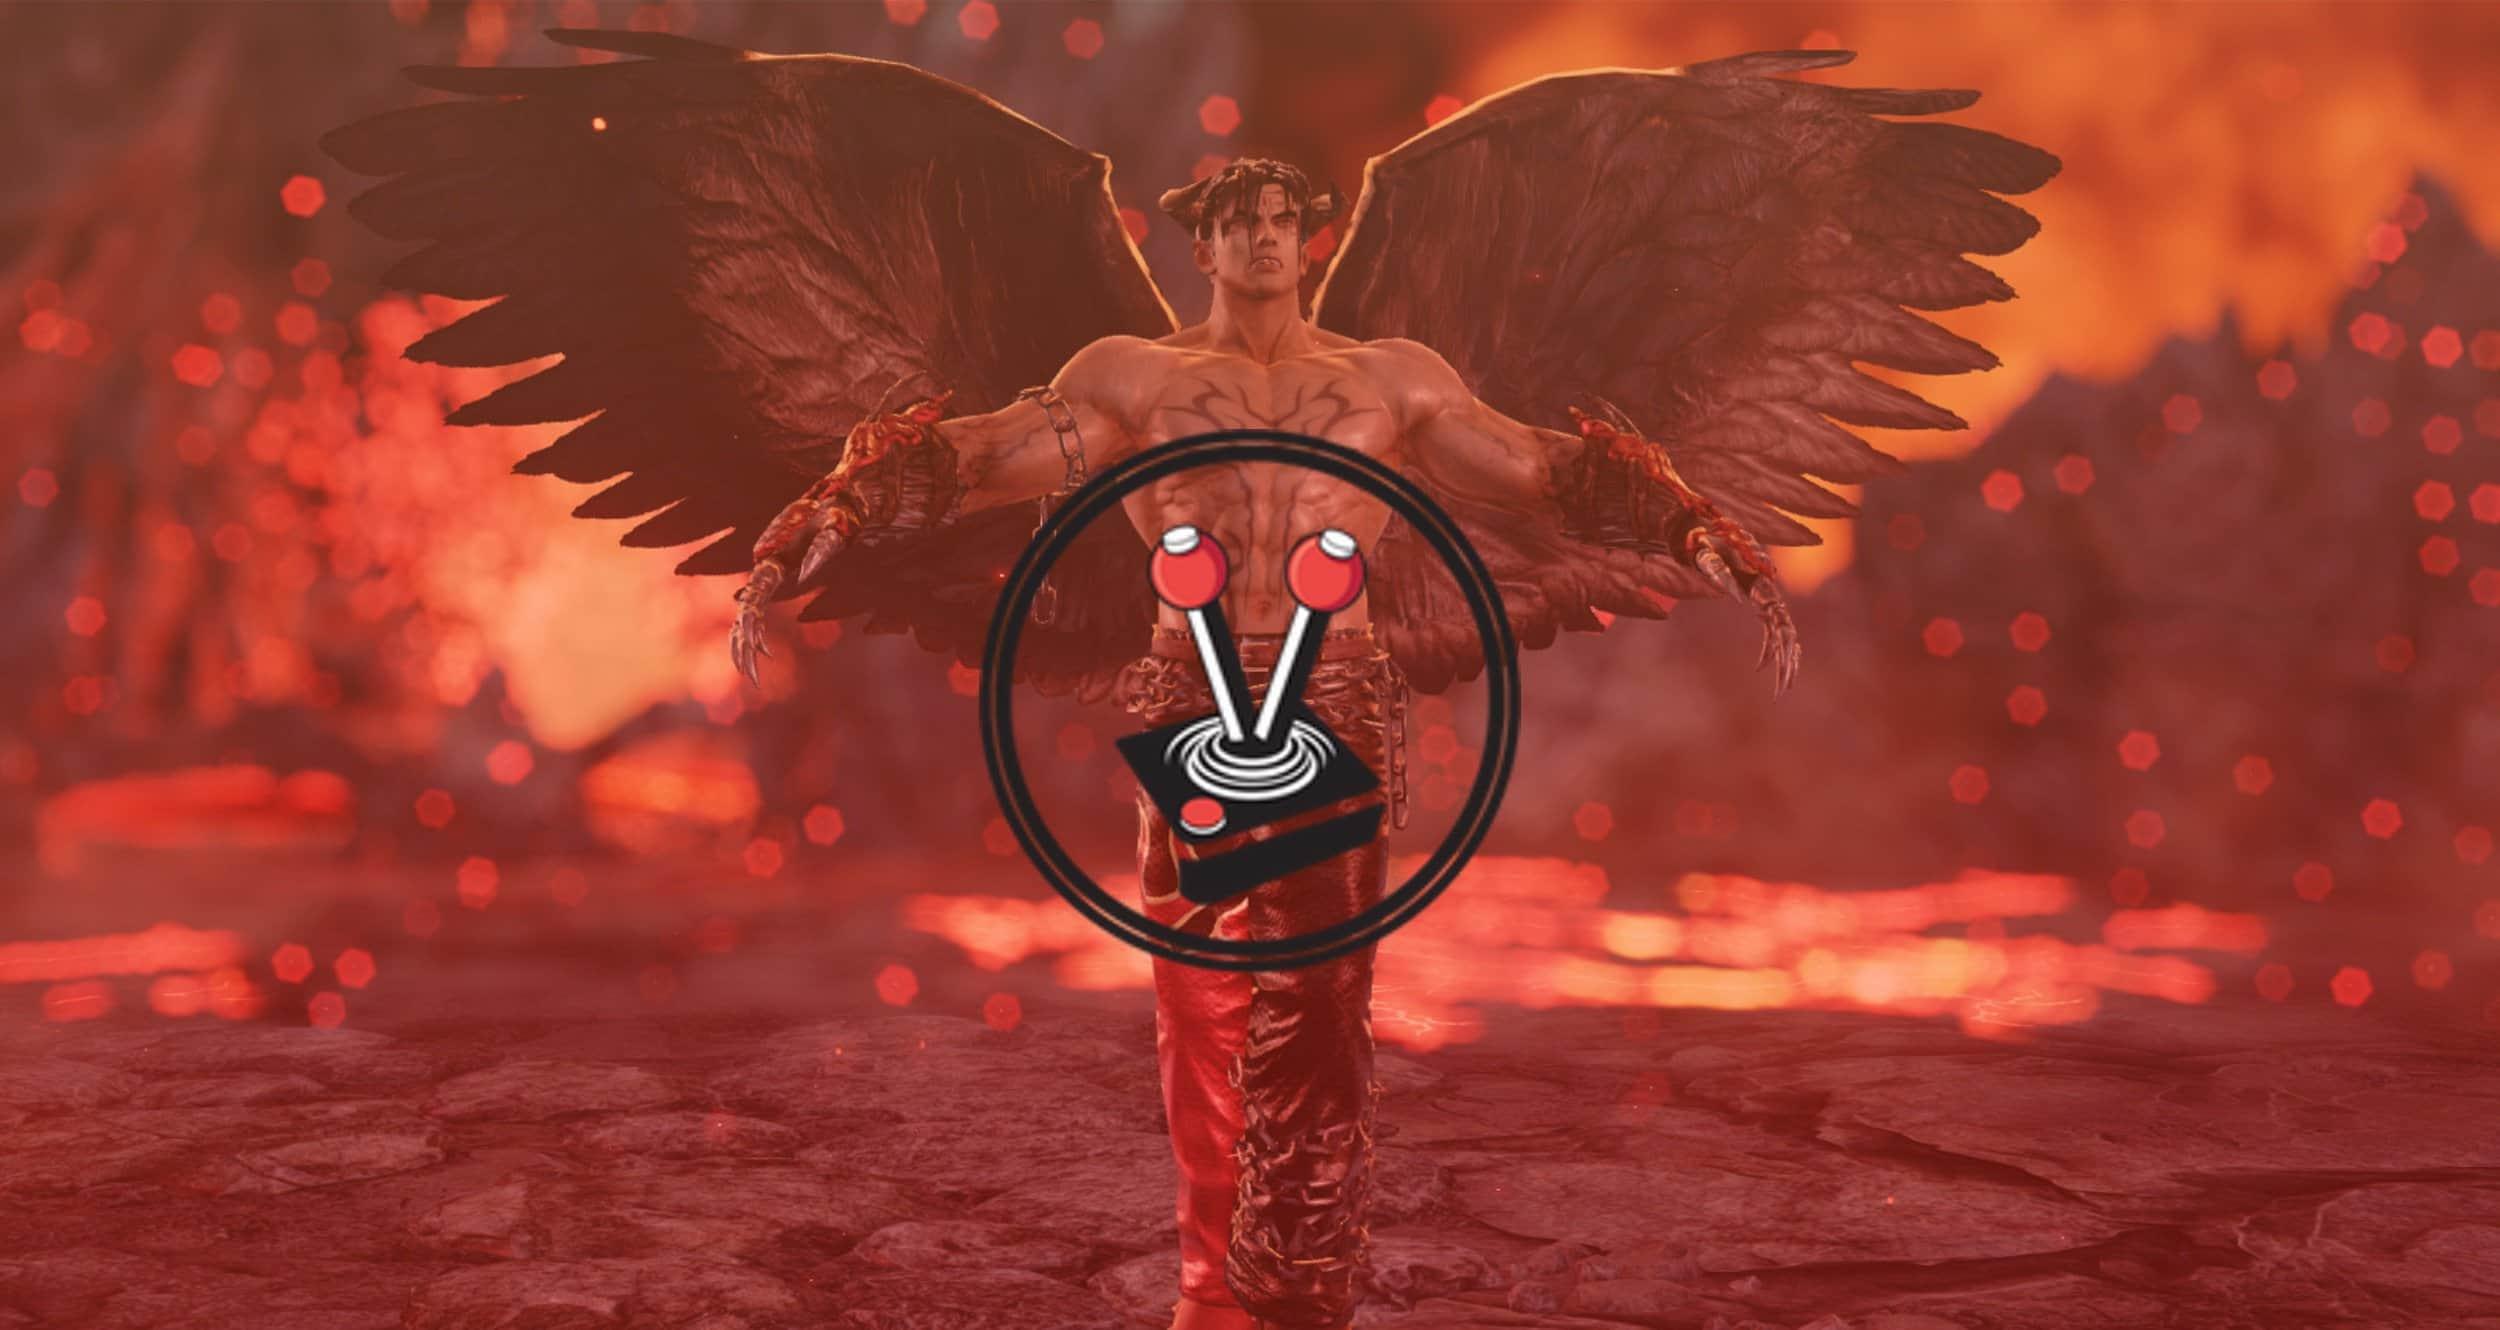 Tekken 7 (2017) is good, but bland [REVIEW]   Vamers